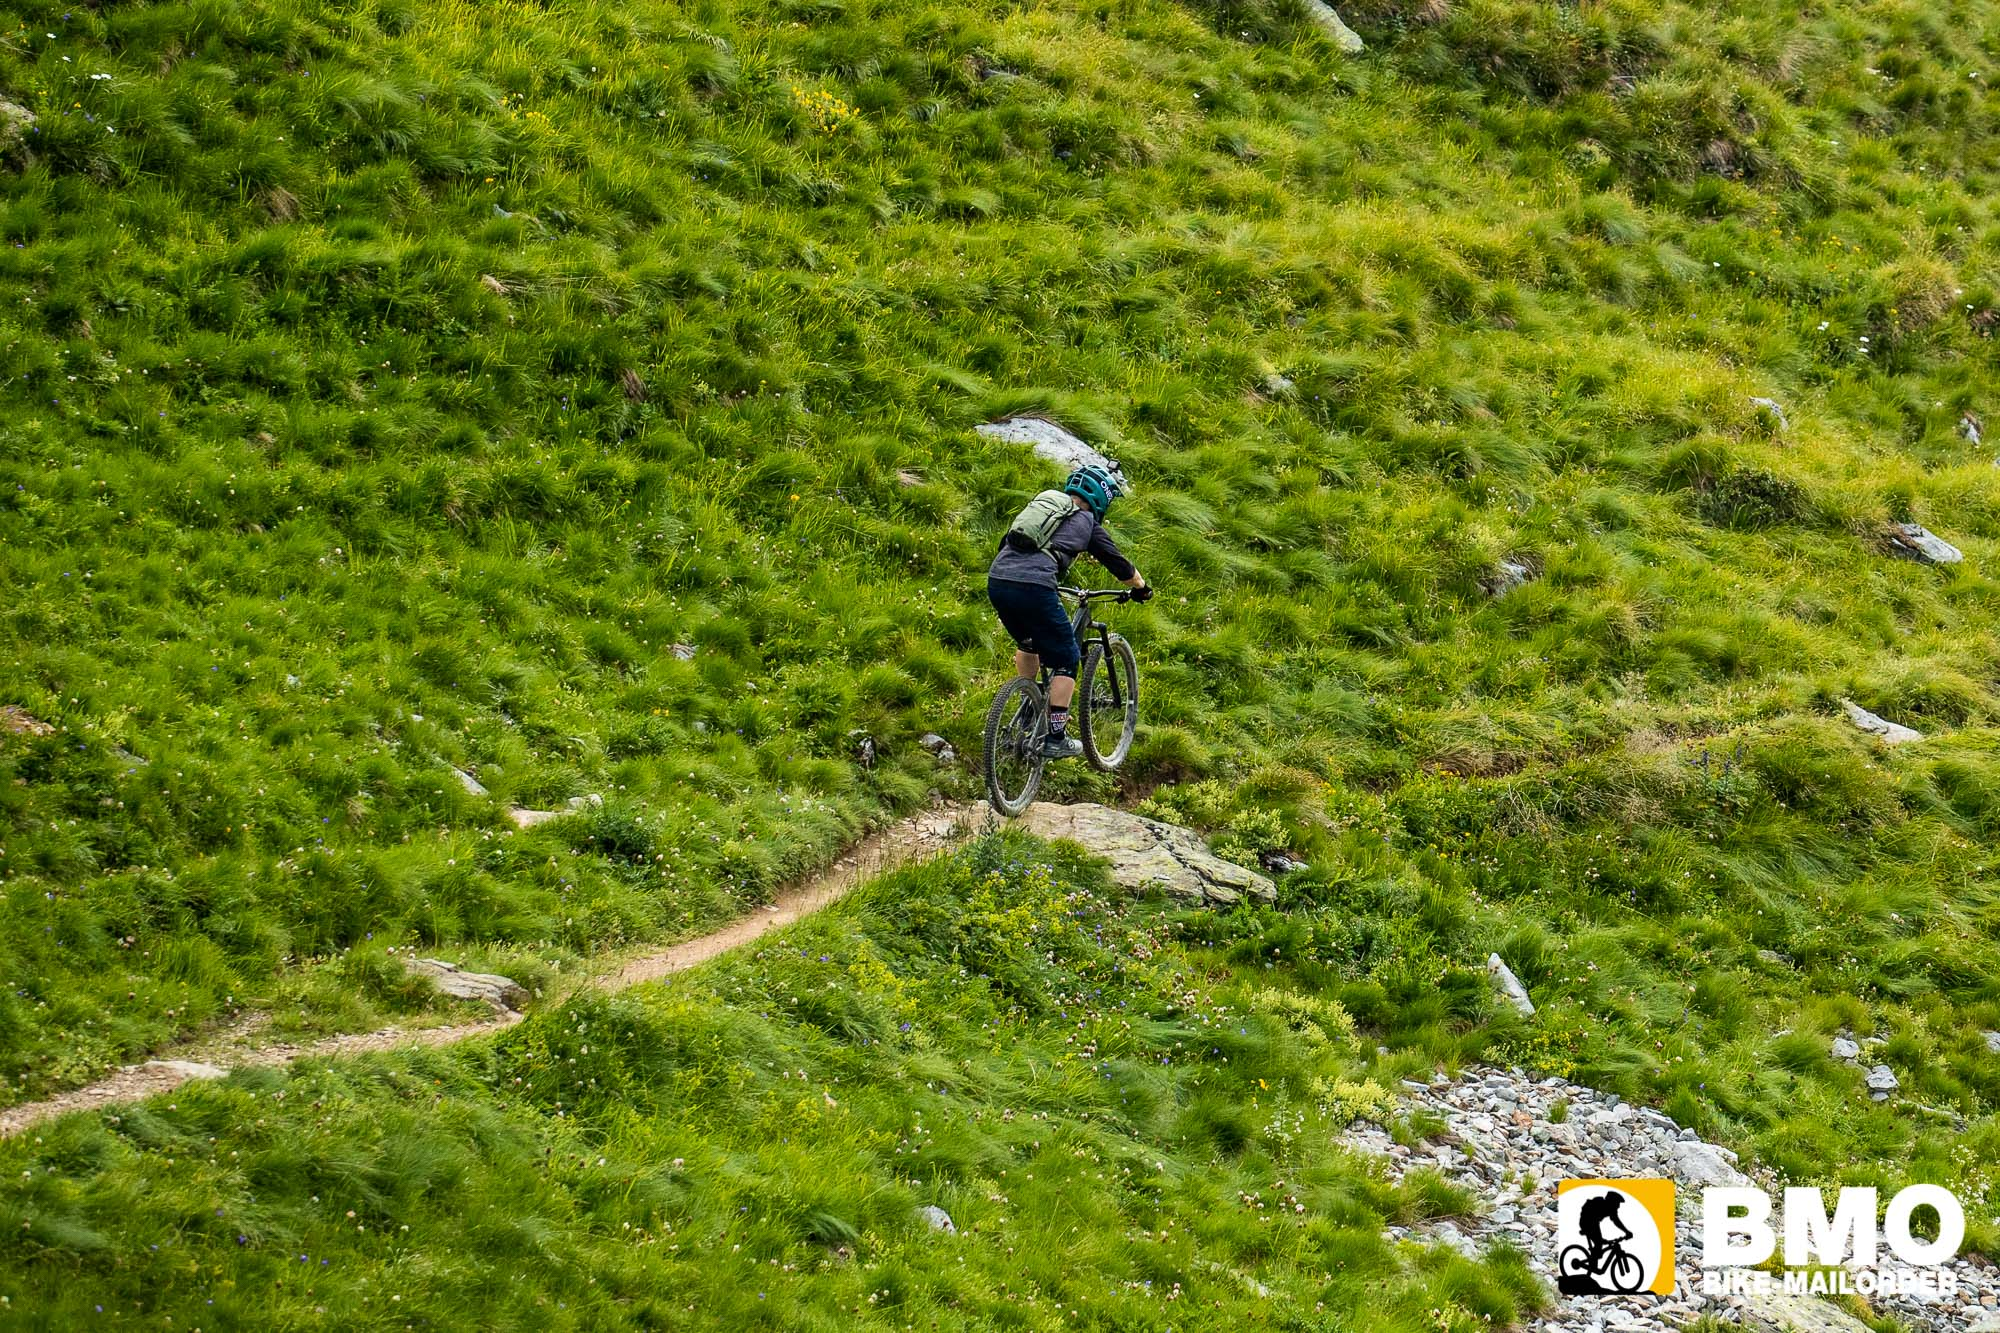 BMO-Bike-Mailorder-Lenzerheide-Home-of-Trails-3